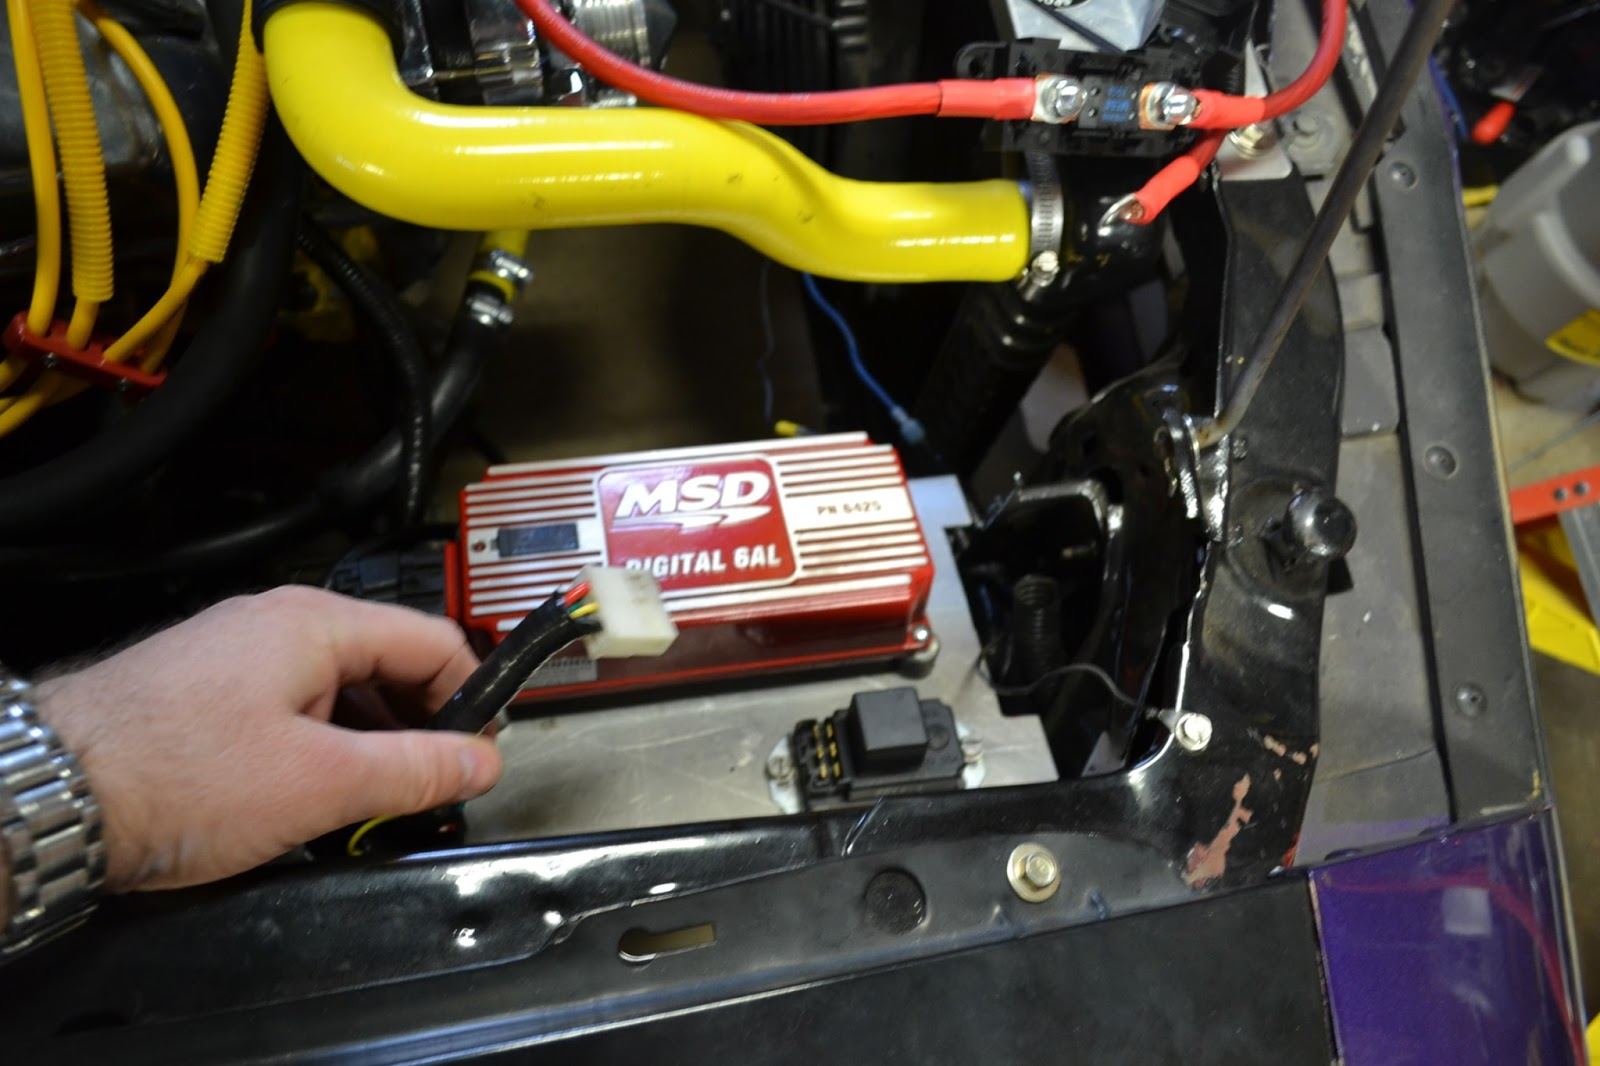 Fox Body Mustang Restoration: 1G to 3G Alternator Conversion